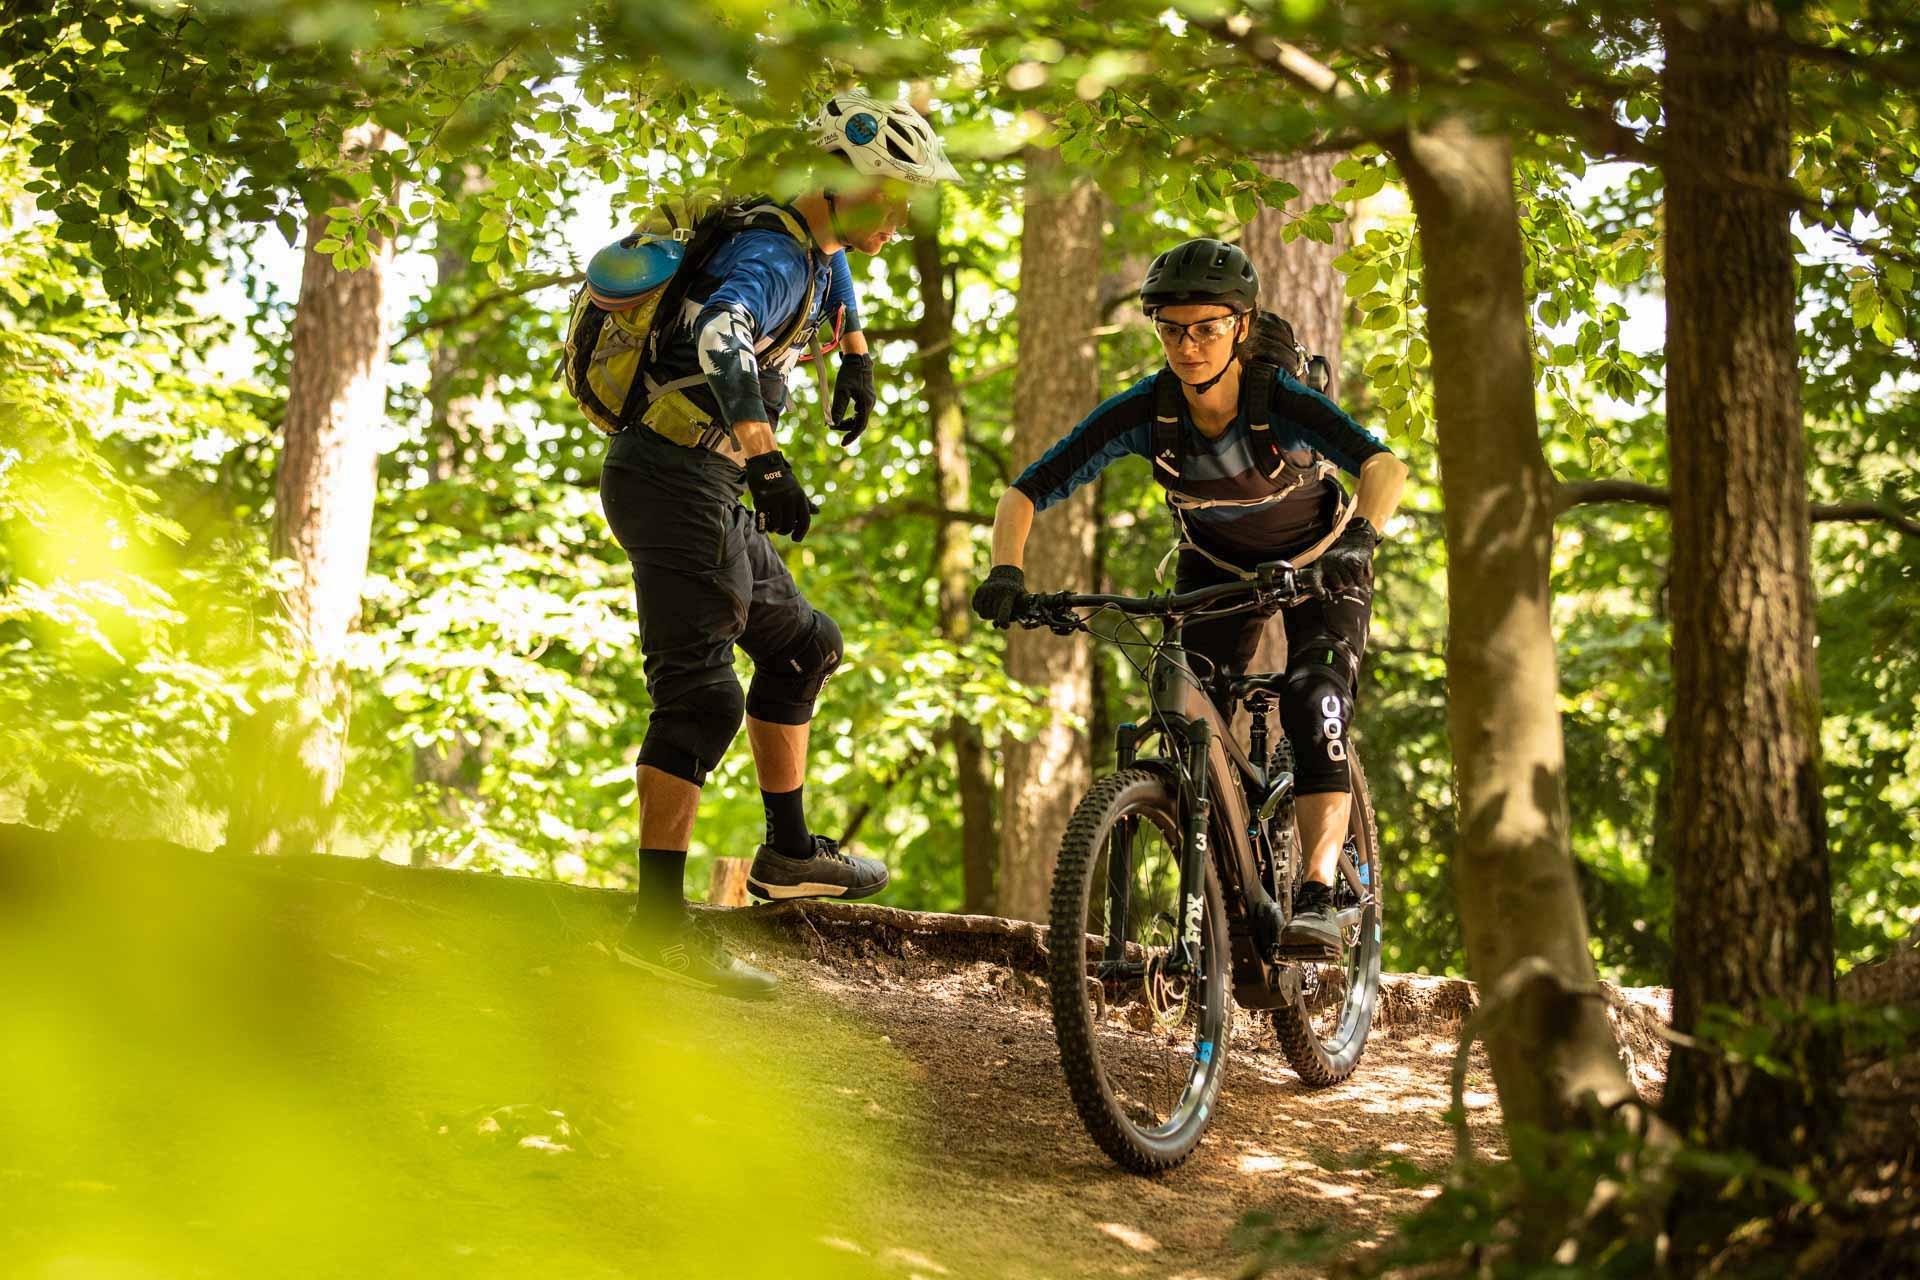 eMTB Einsteiger Fahrtechnik Kurs Pforzheim - Mountainbike Training - Rock my Trail Bikeschule